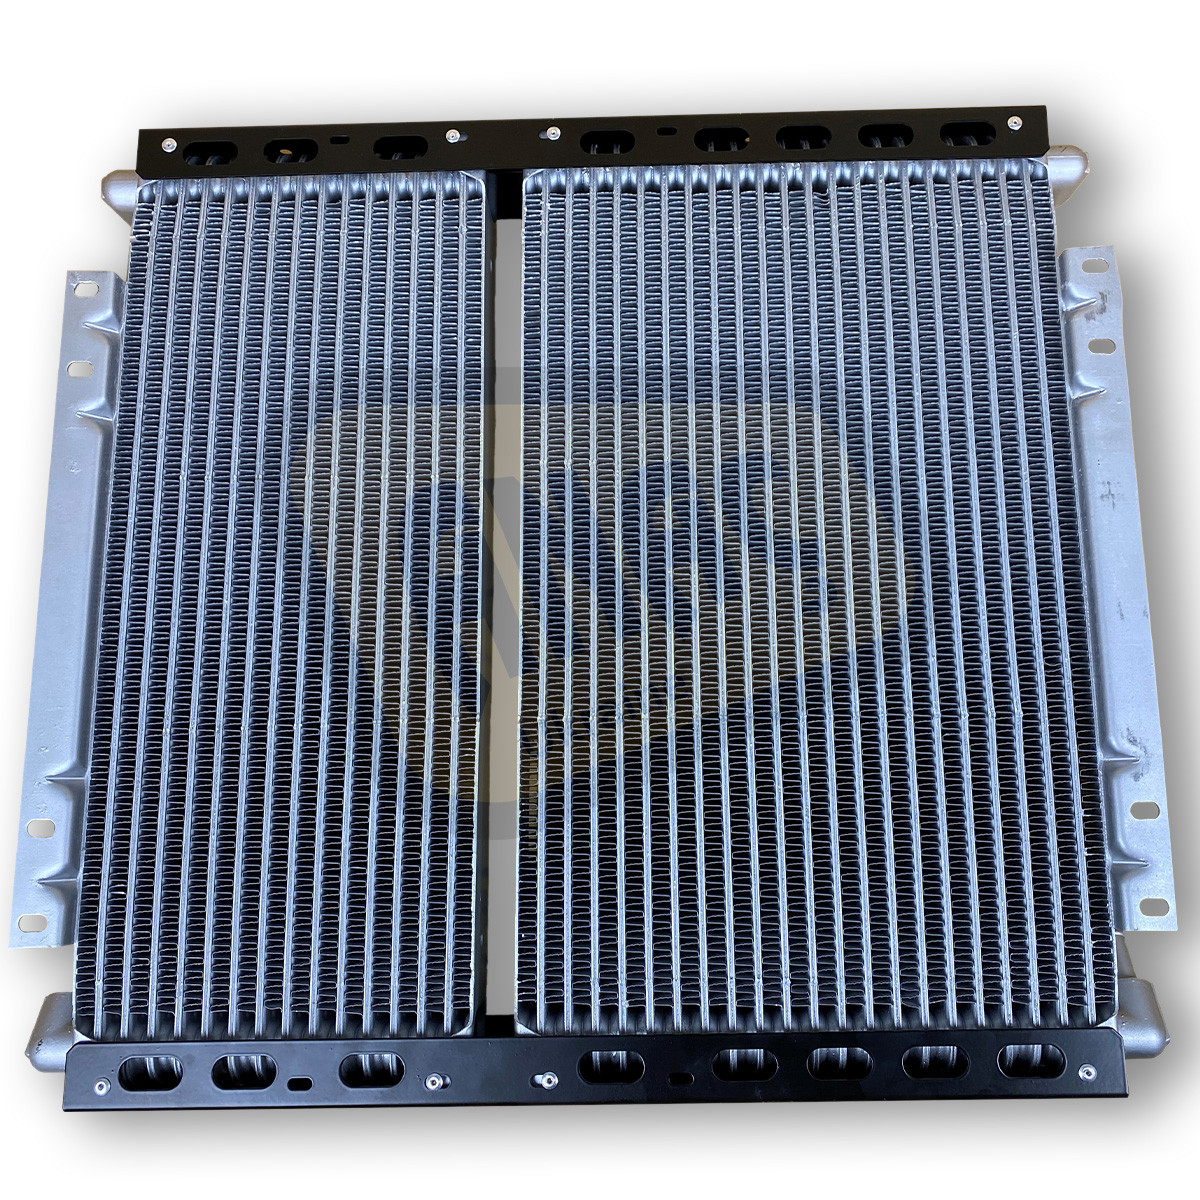 30/925615, 30/925615, 332/G3688, 128/14077 Радиатор на JCB 3CX, 4CX